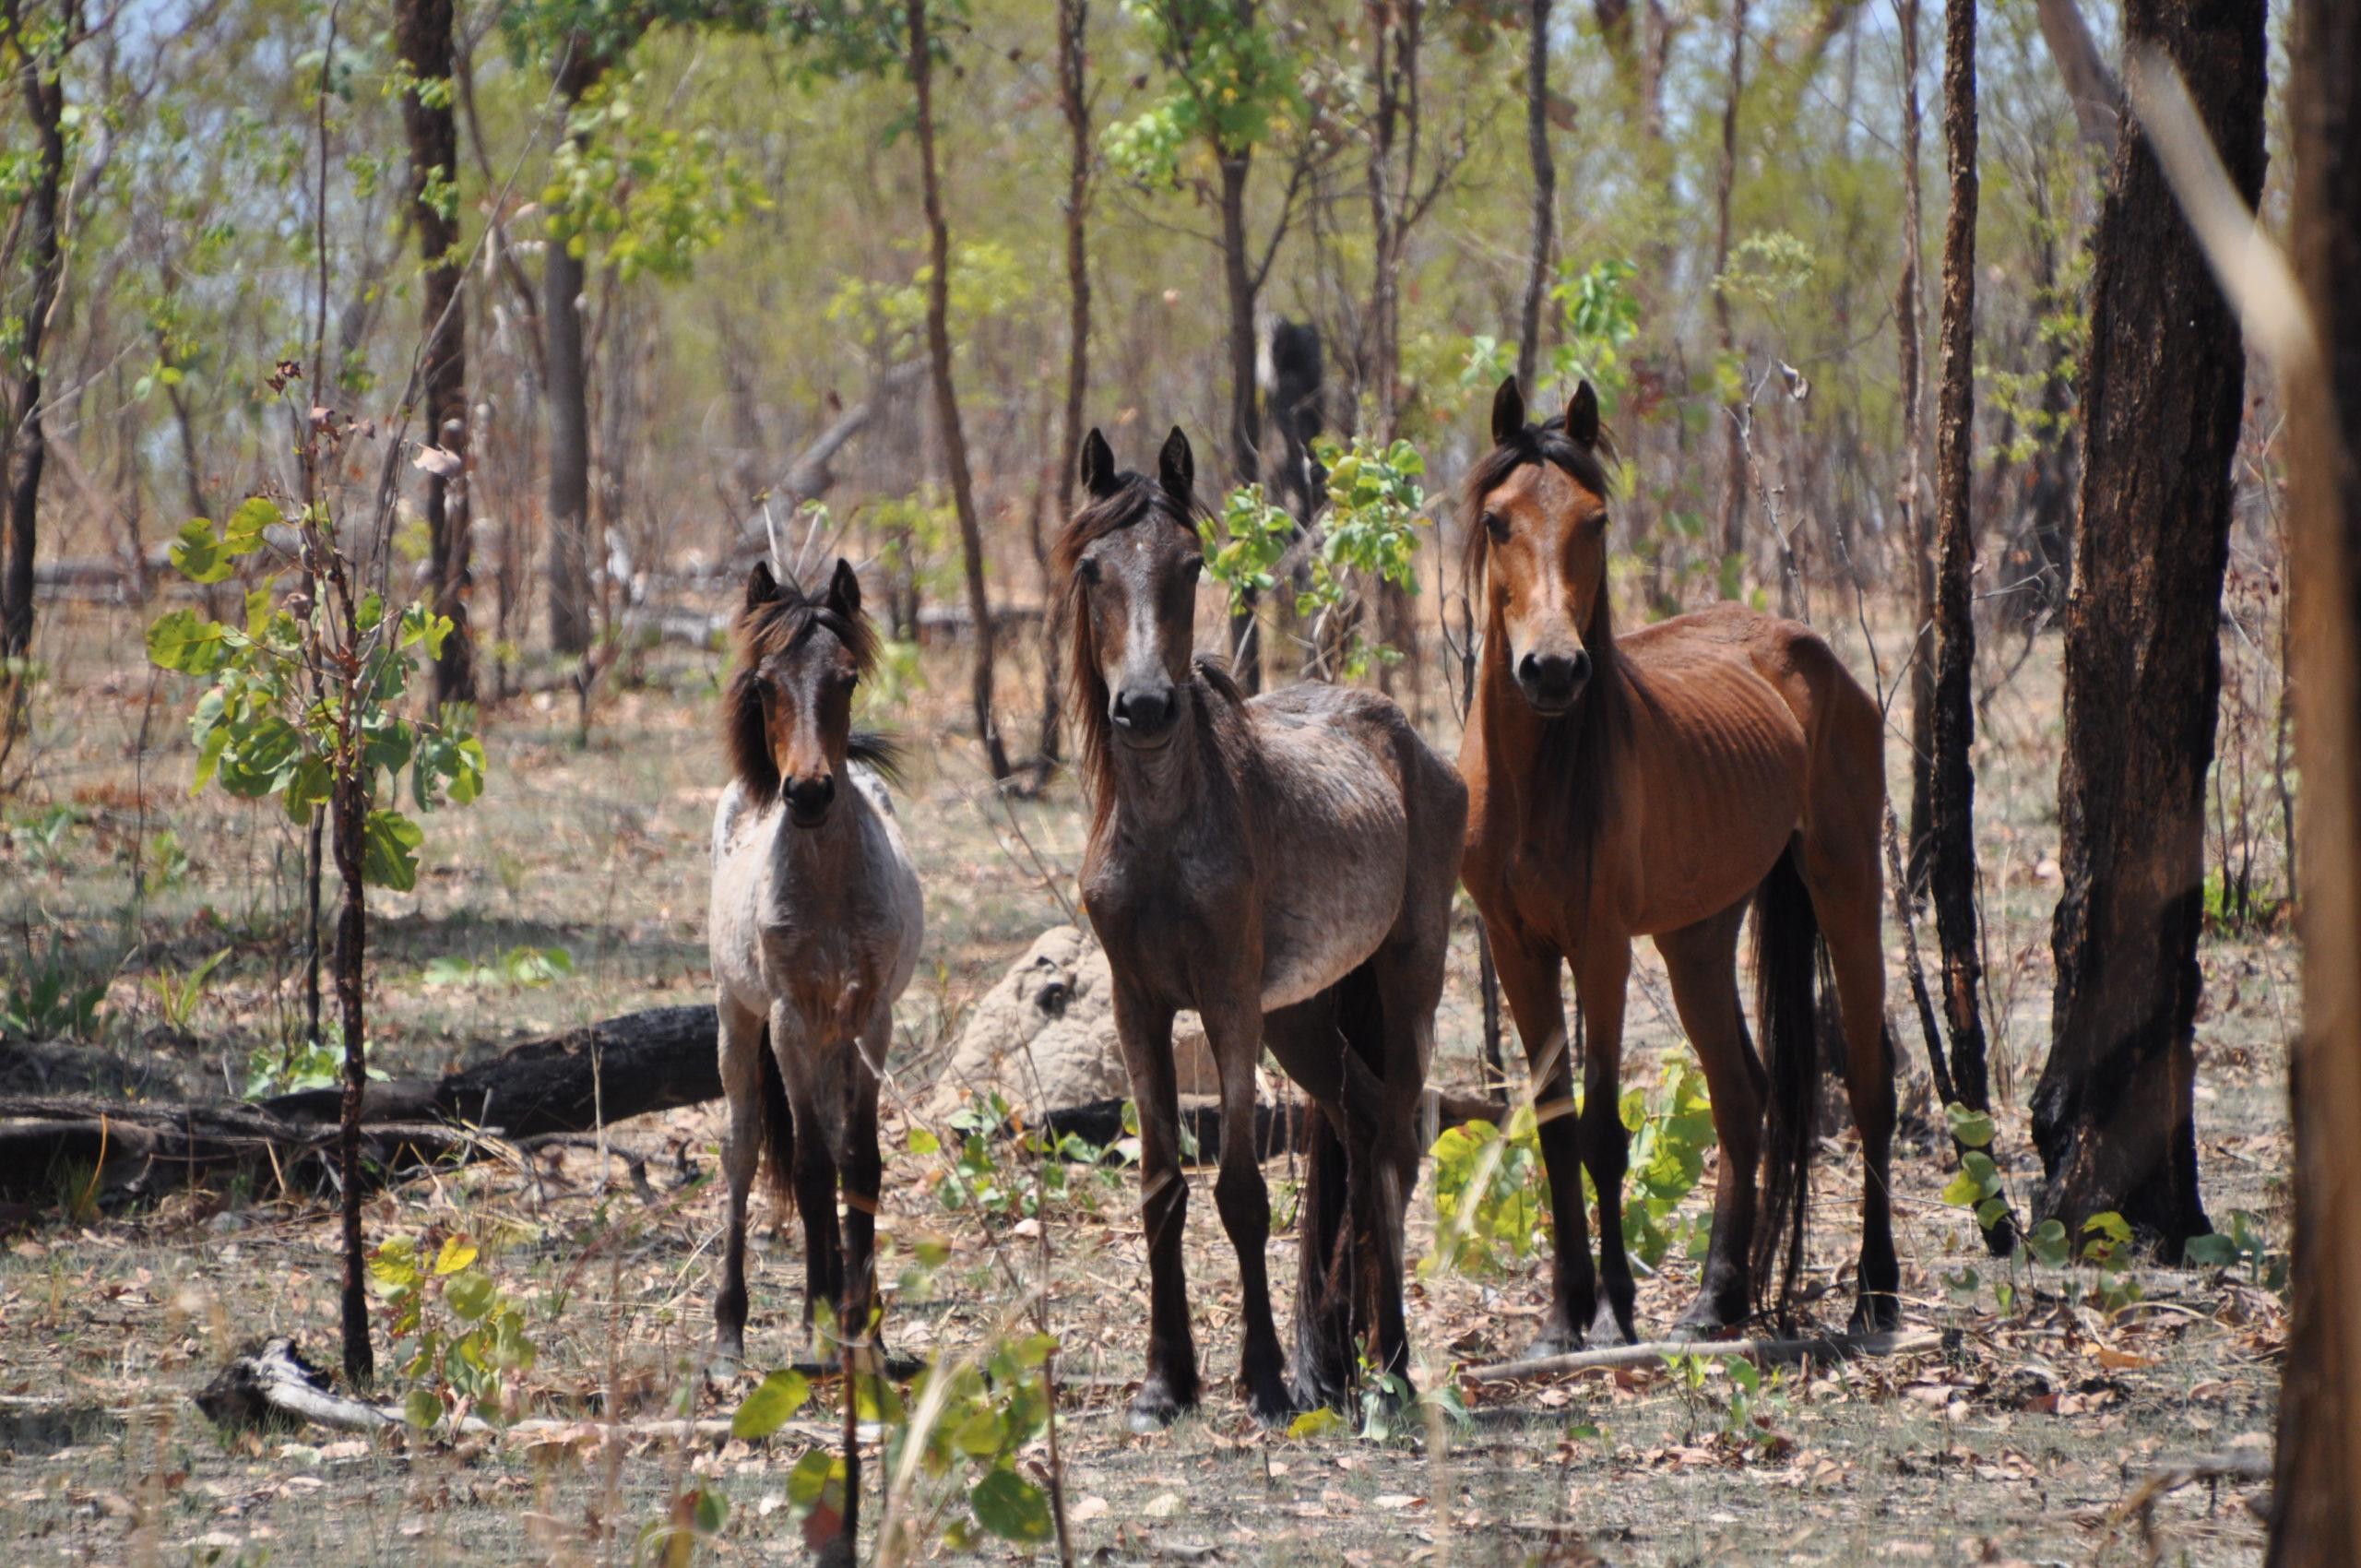 Franz Weber Territory – Reserva de caballos salvajes en Australia